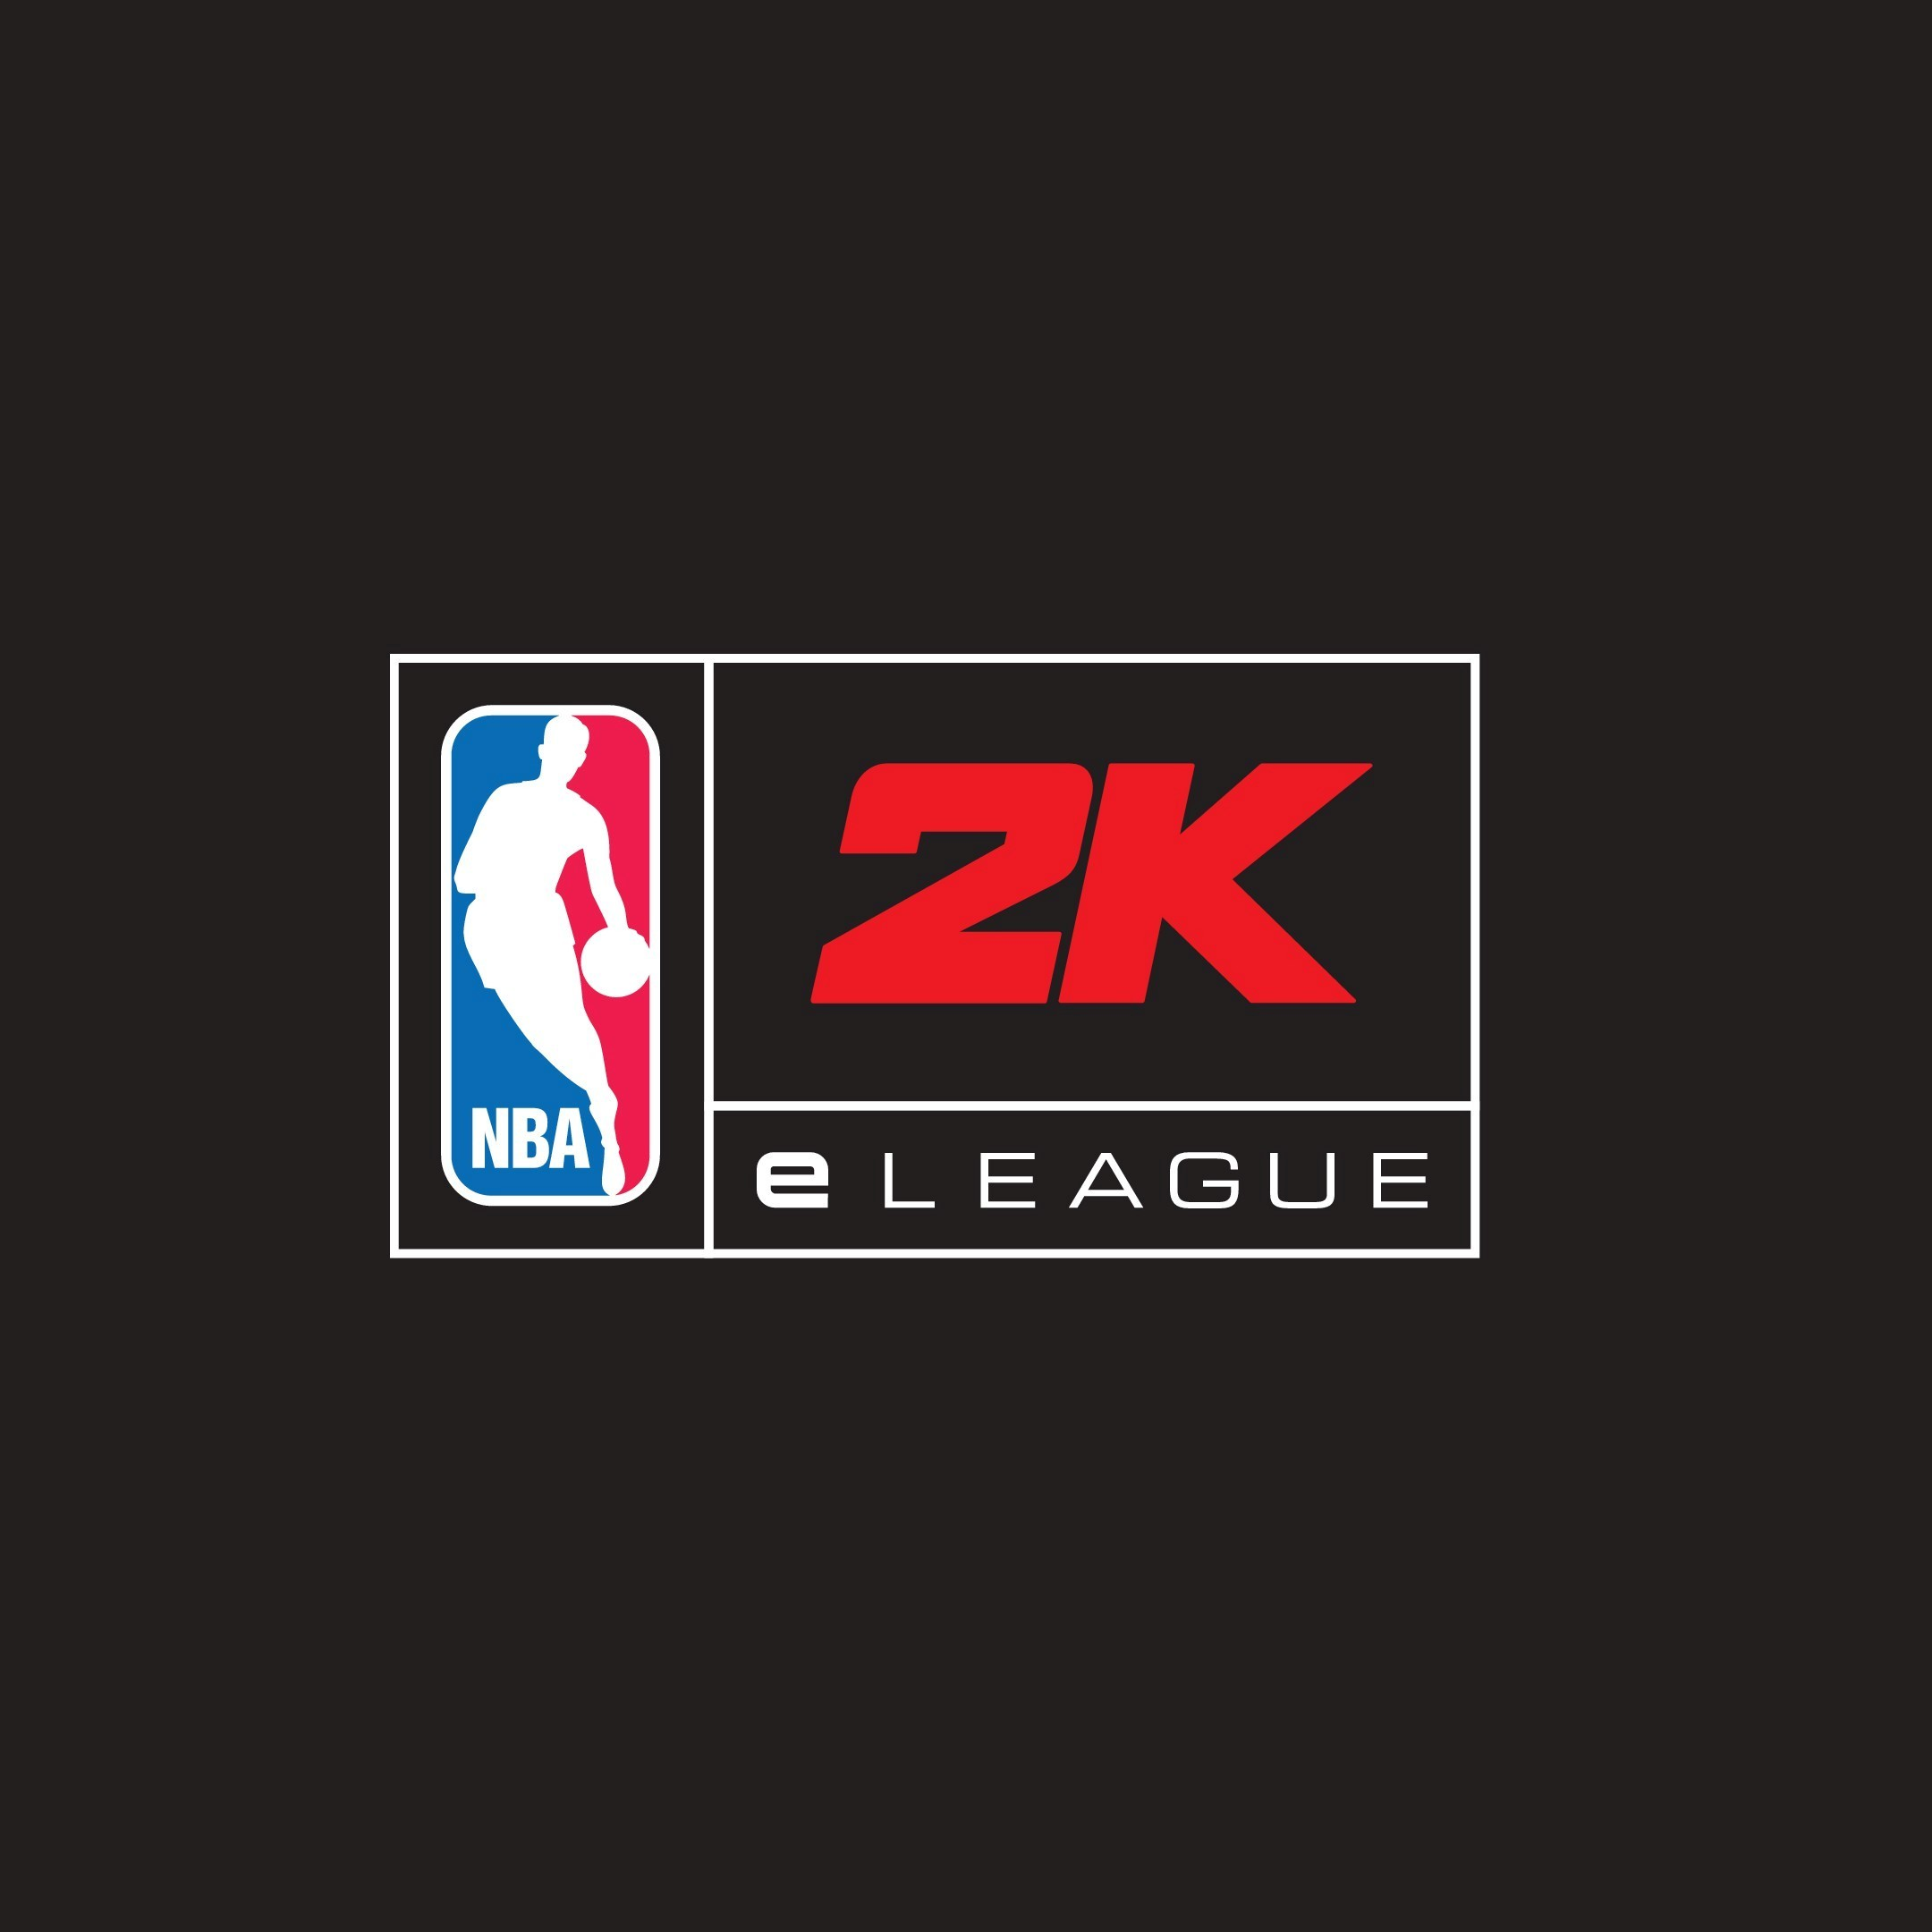 NBA 2K eLeague logo